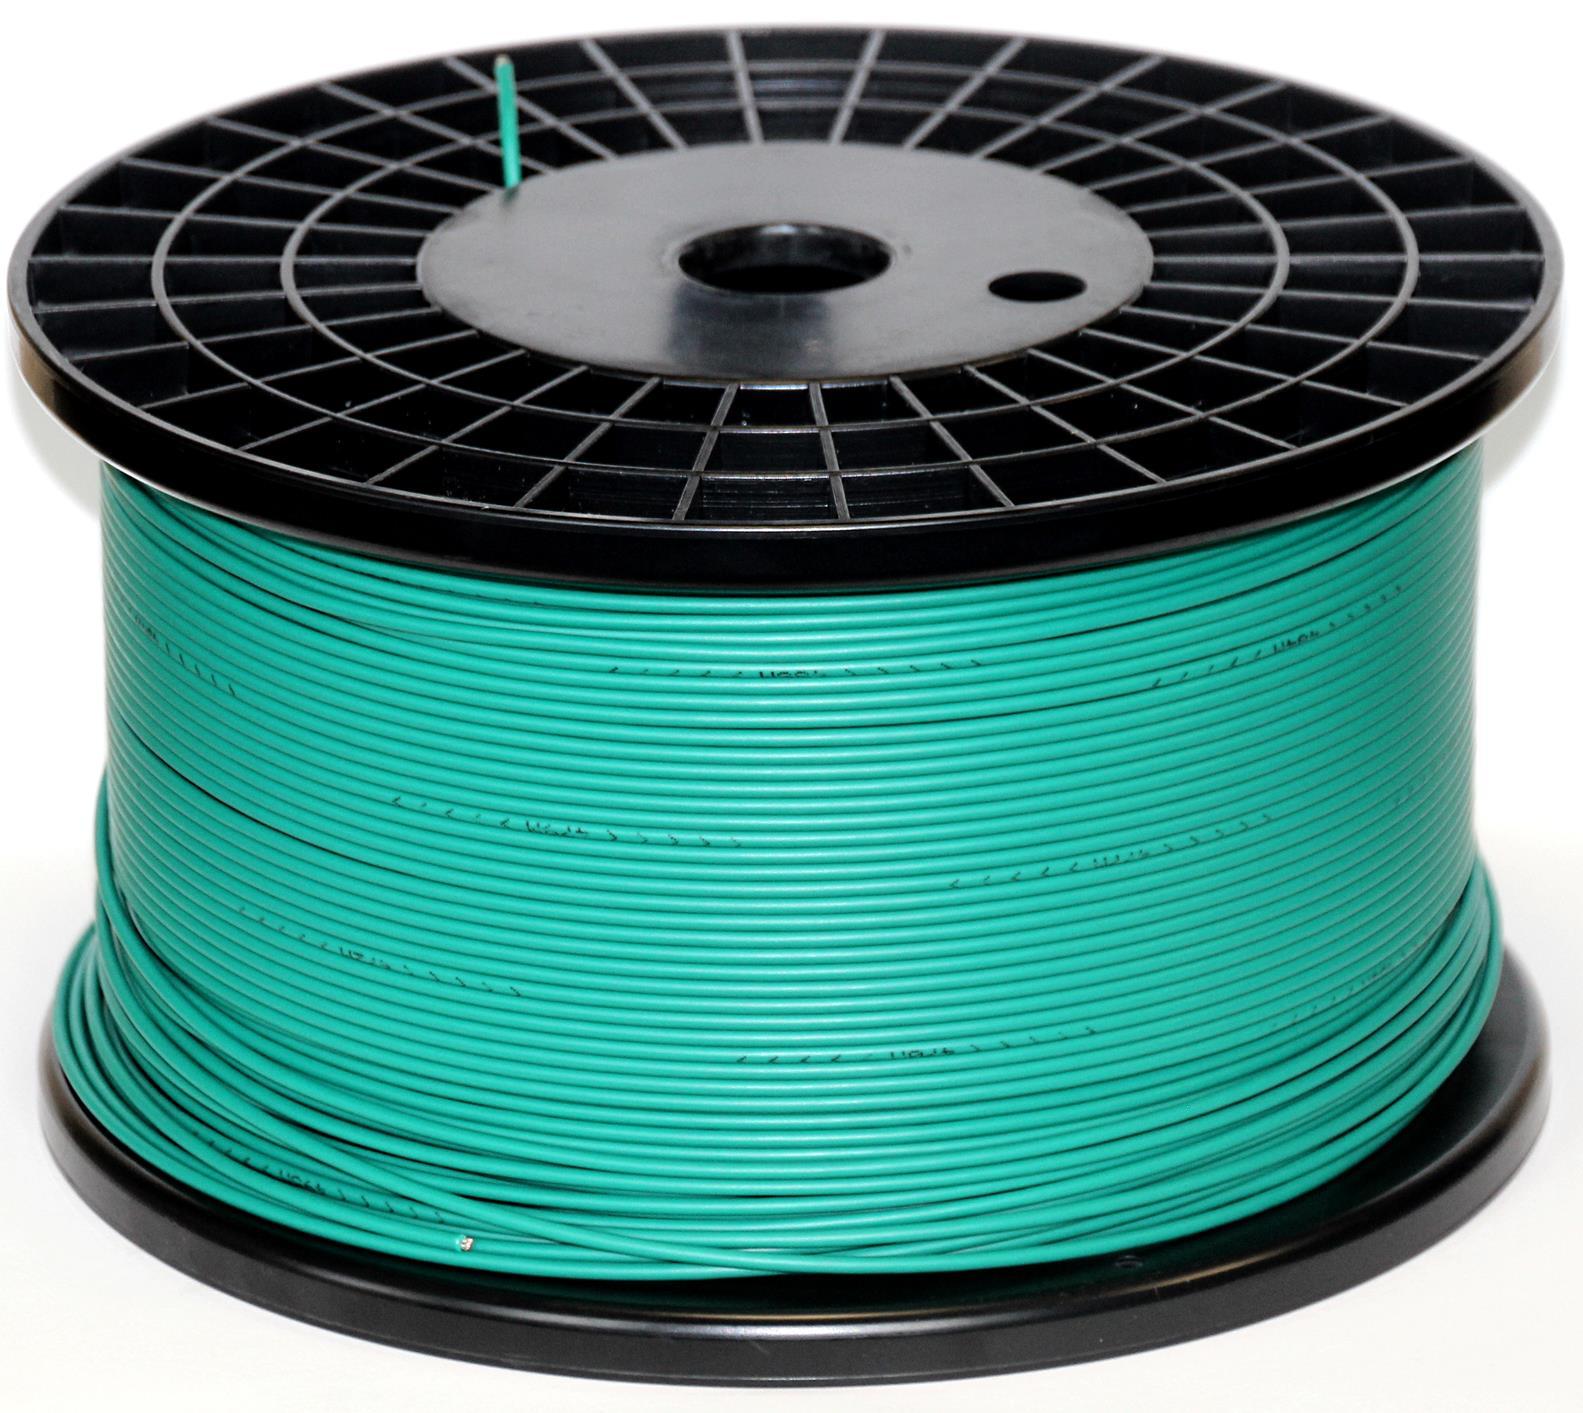 Genisys Reparaturset M kompatibel mit Gardena /® R160Li R165 R180 Kabel Haken Verbinder Reparatur Paket